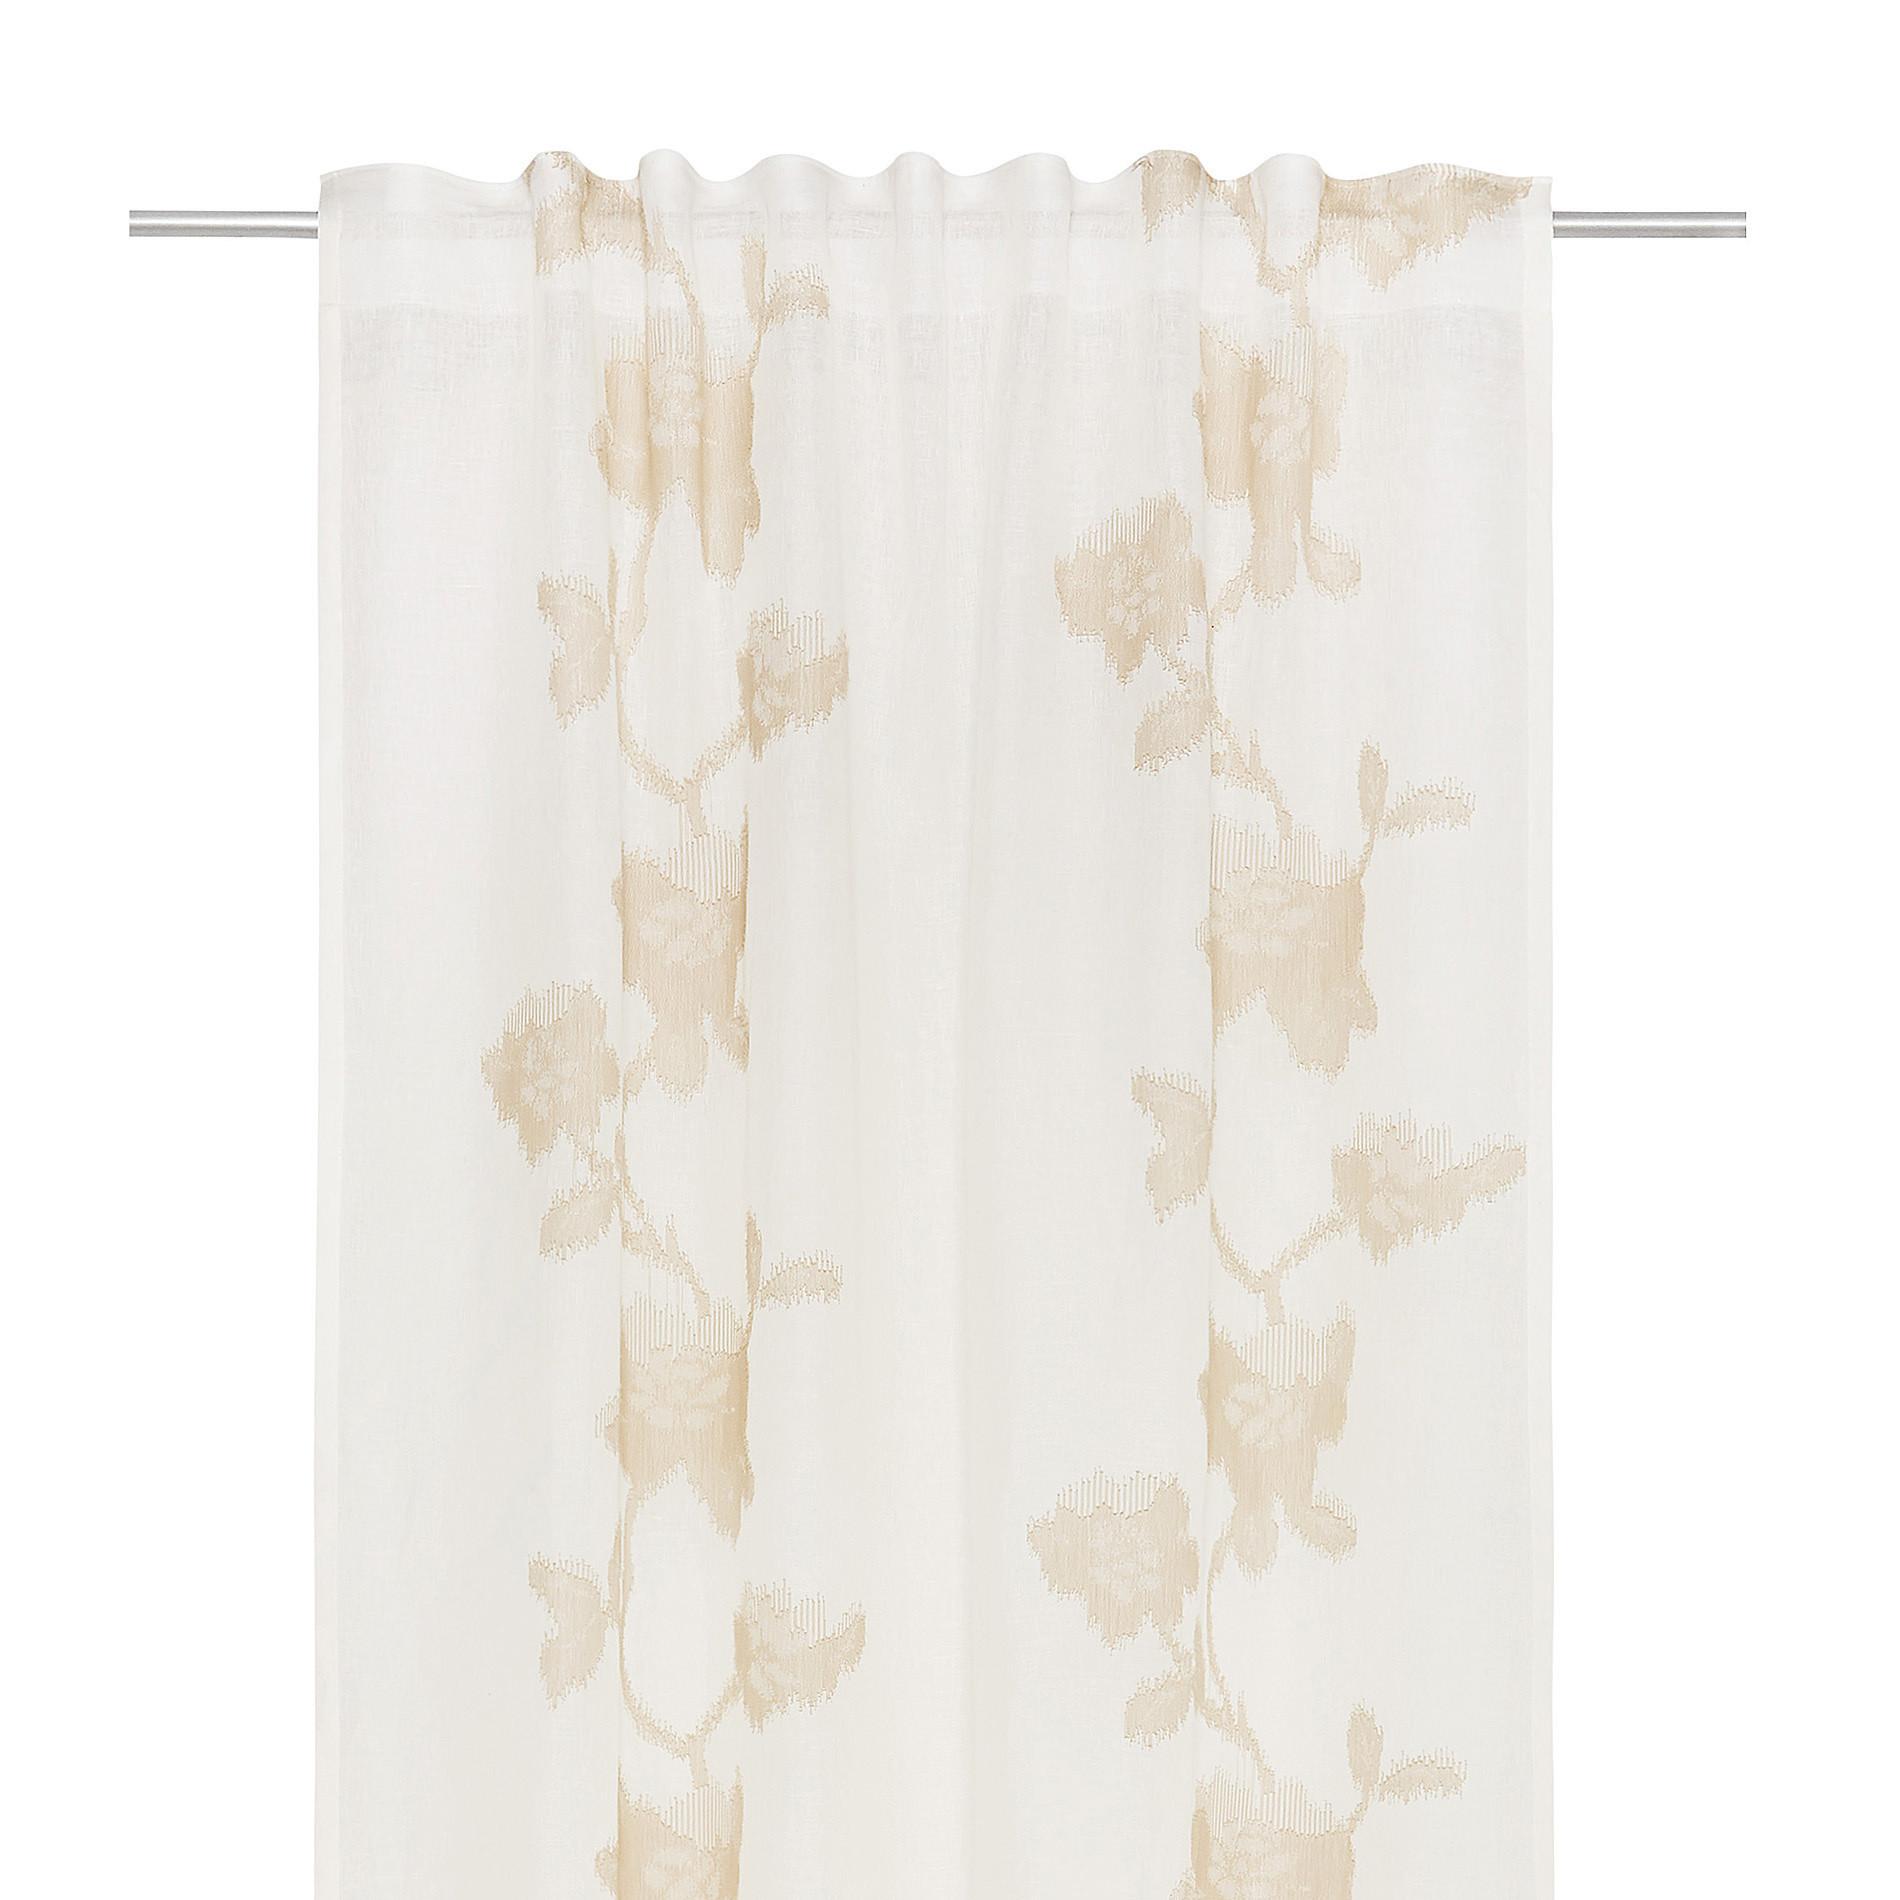 Tenda puro lino ricami floreali, Bianco/Oro, large image number 2